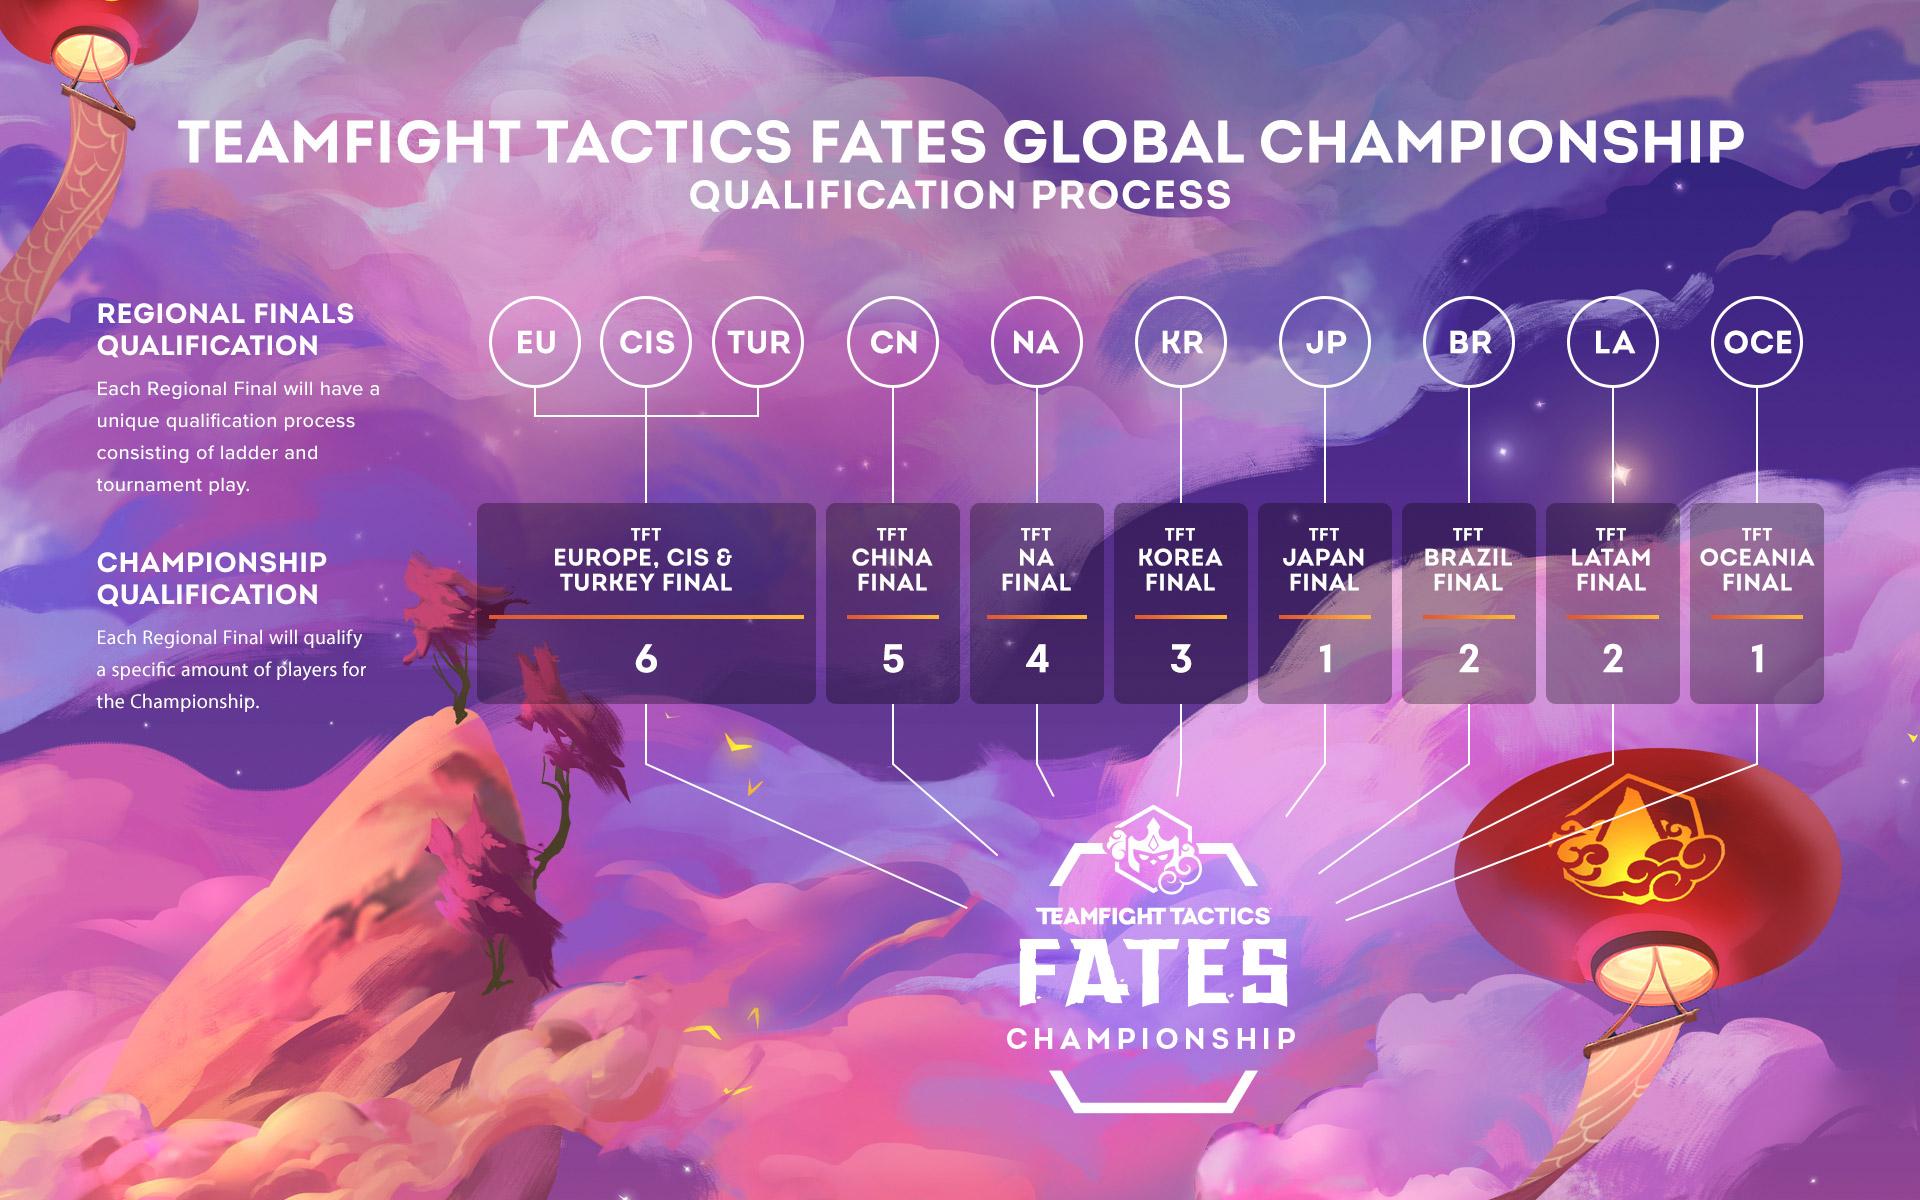 2-10-20-tft-fates-championship-TFT-Qualification-Process.jpg